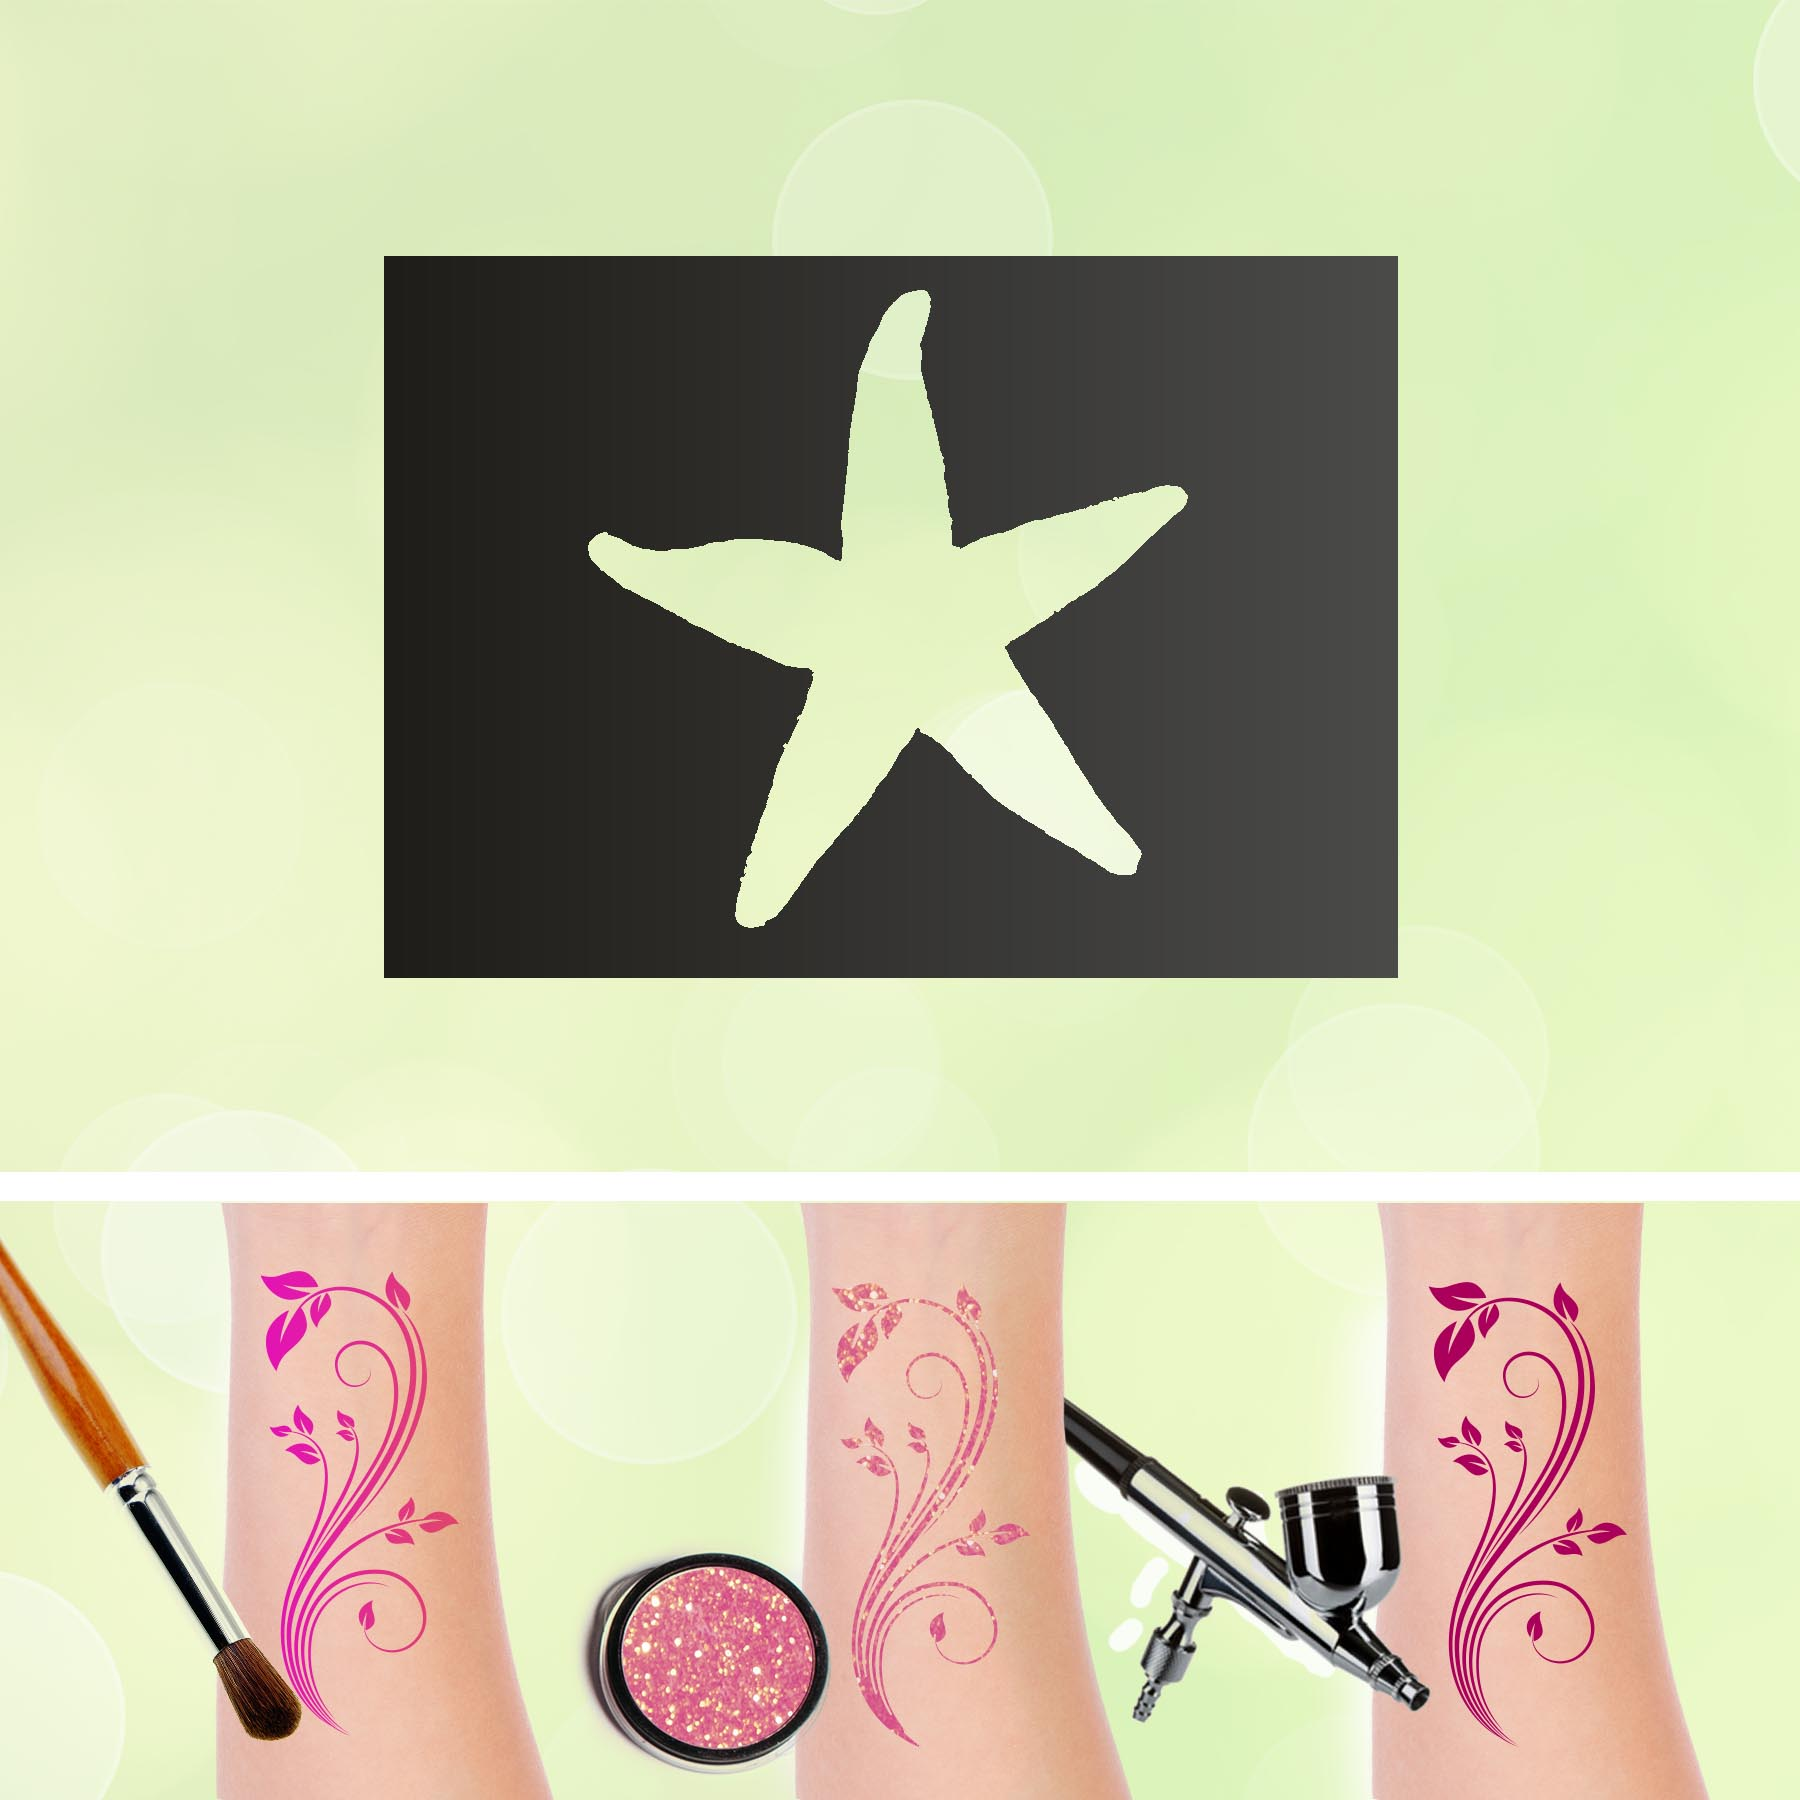 Tattoo Schablonen Seestern Selbstklebend Kinderschminken Airbrush